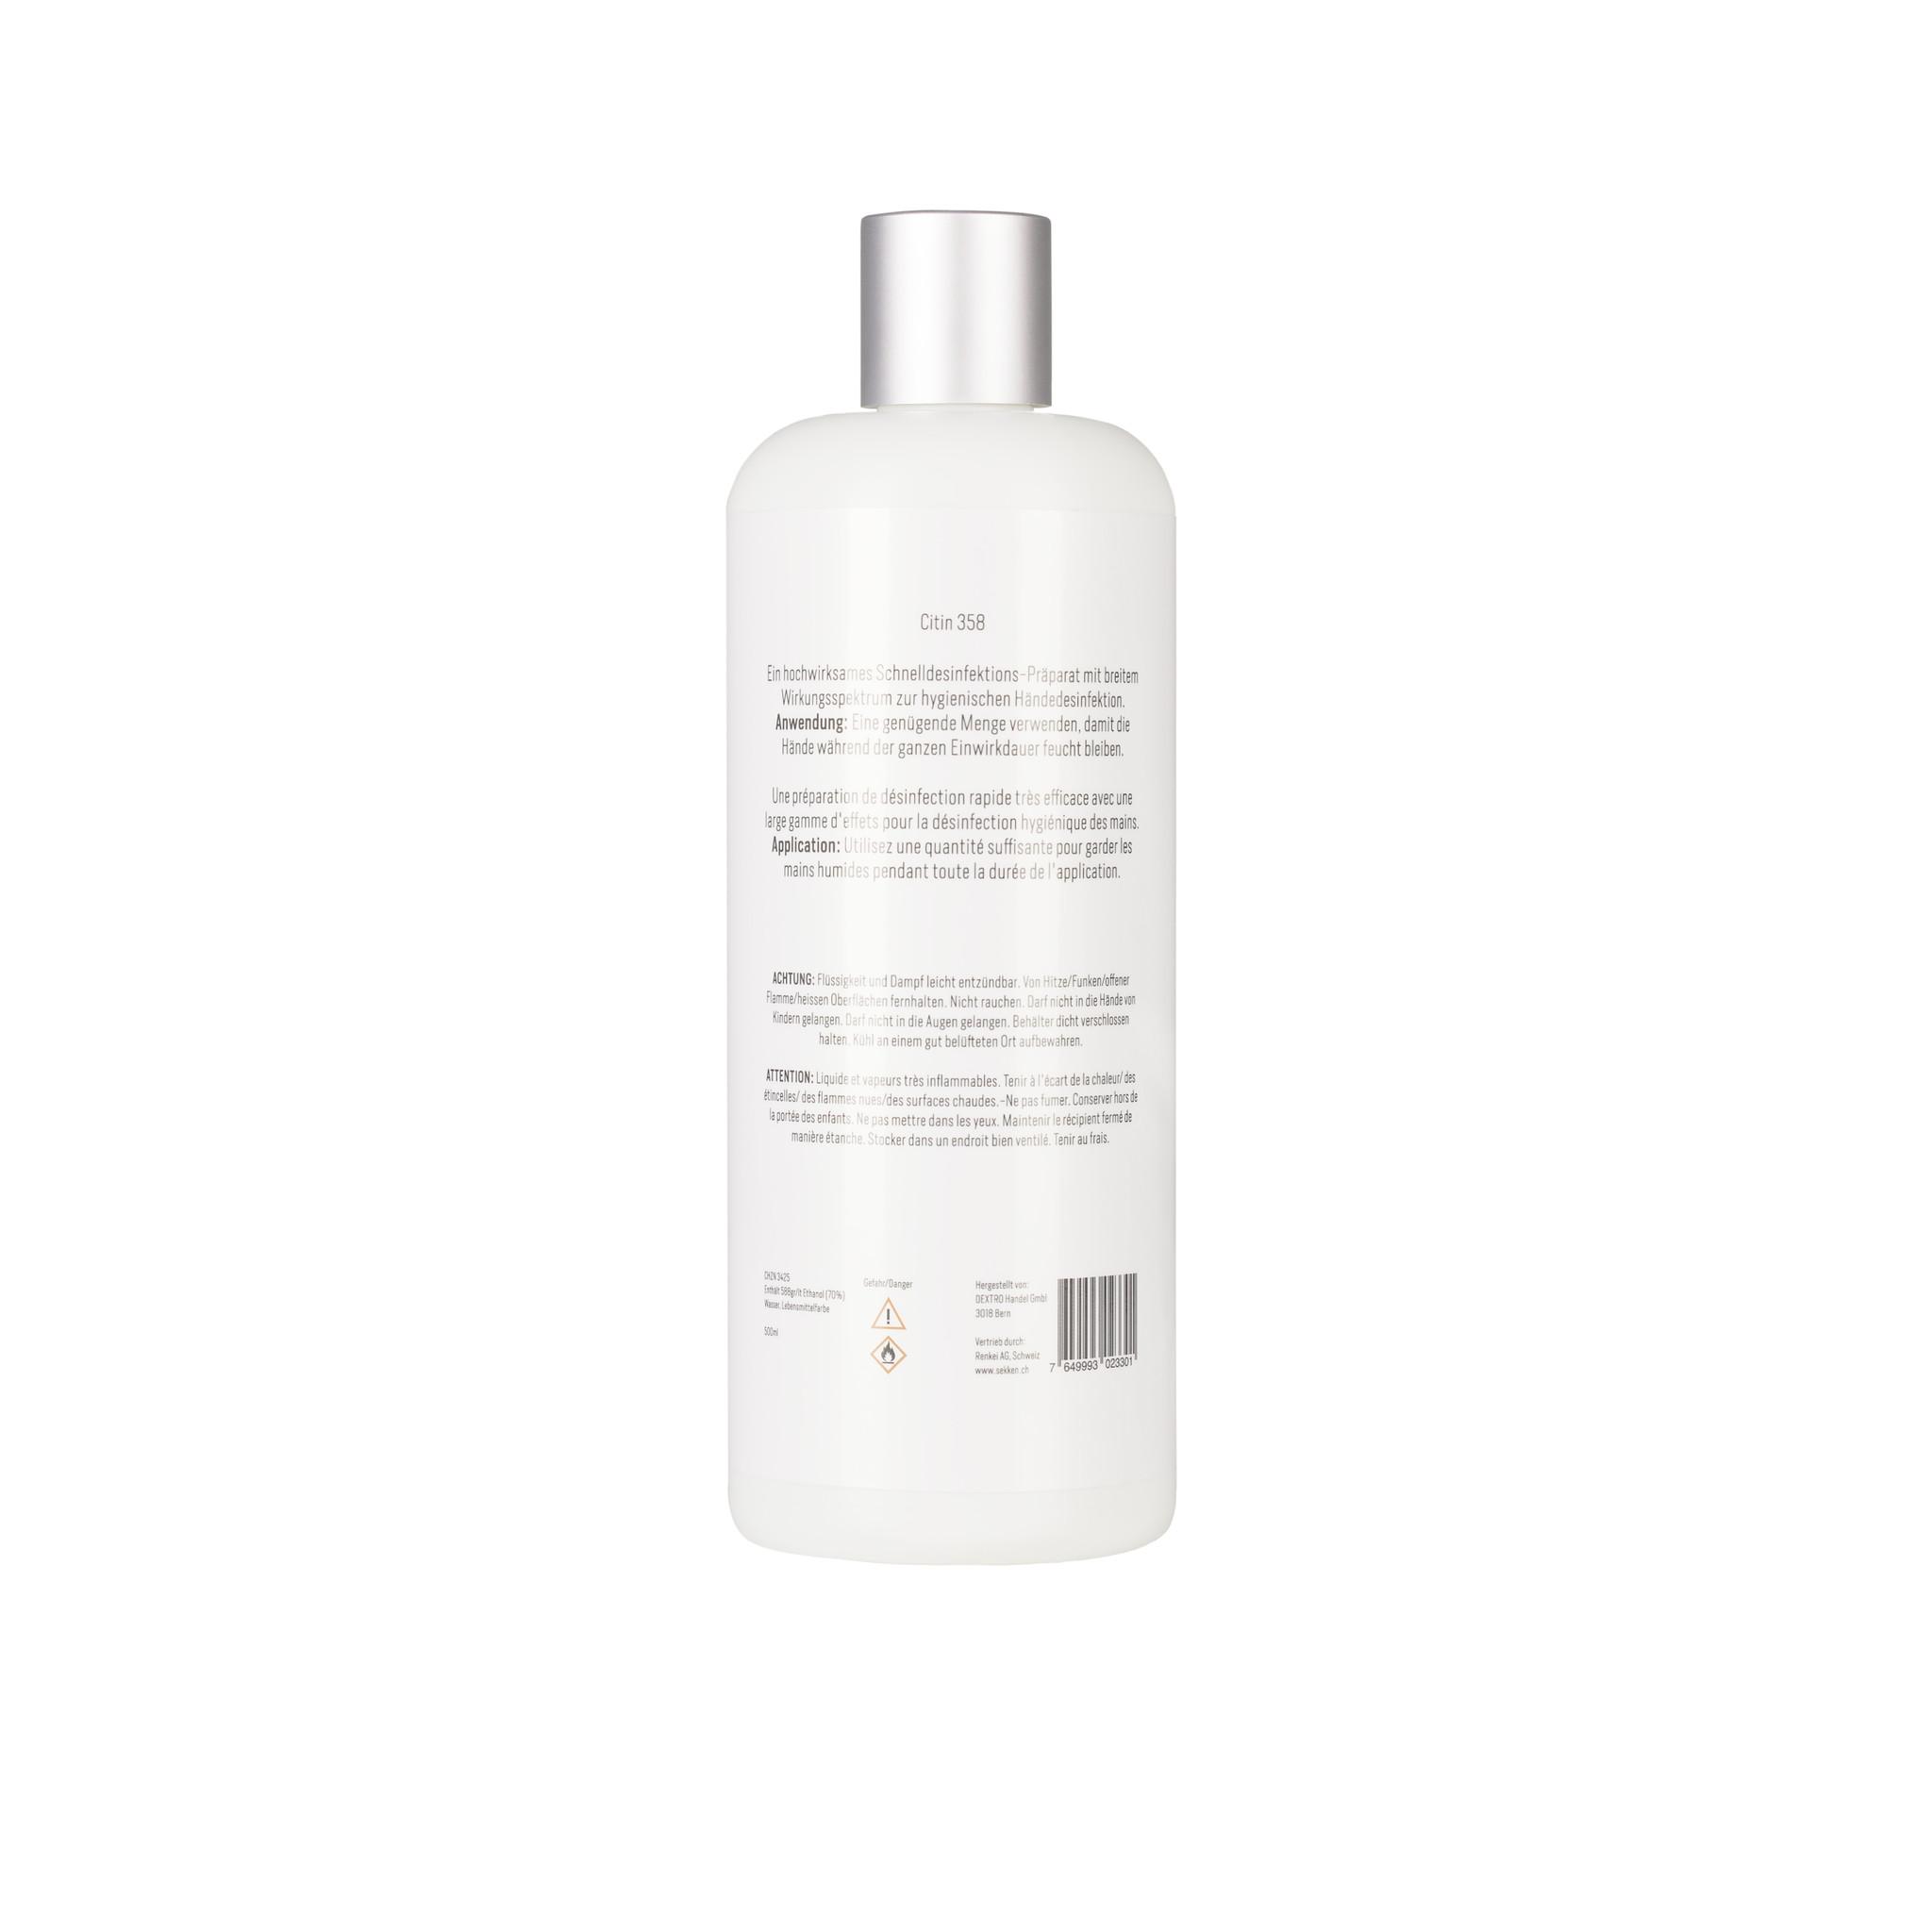 Hand Sanitizer Citin 358 500ml  Promo-2